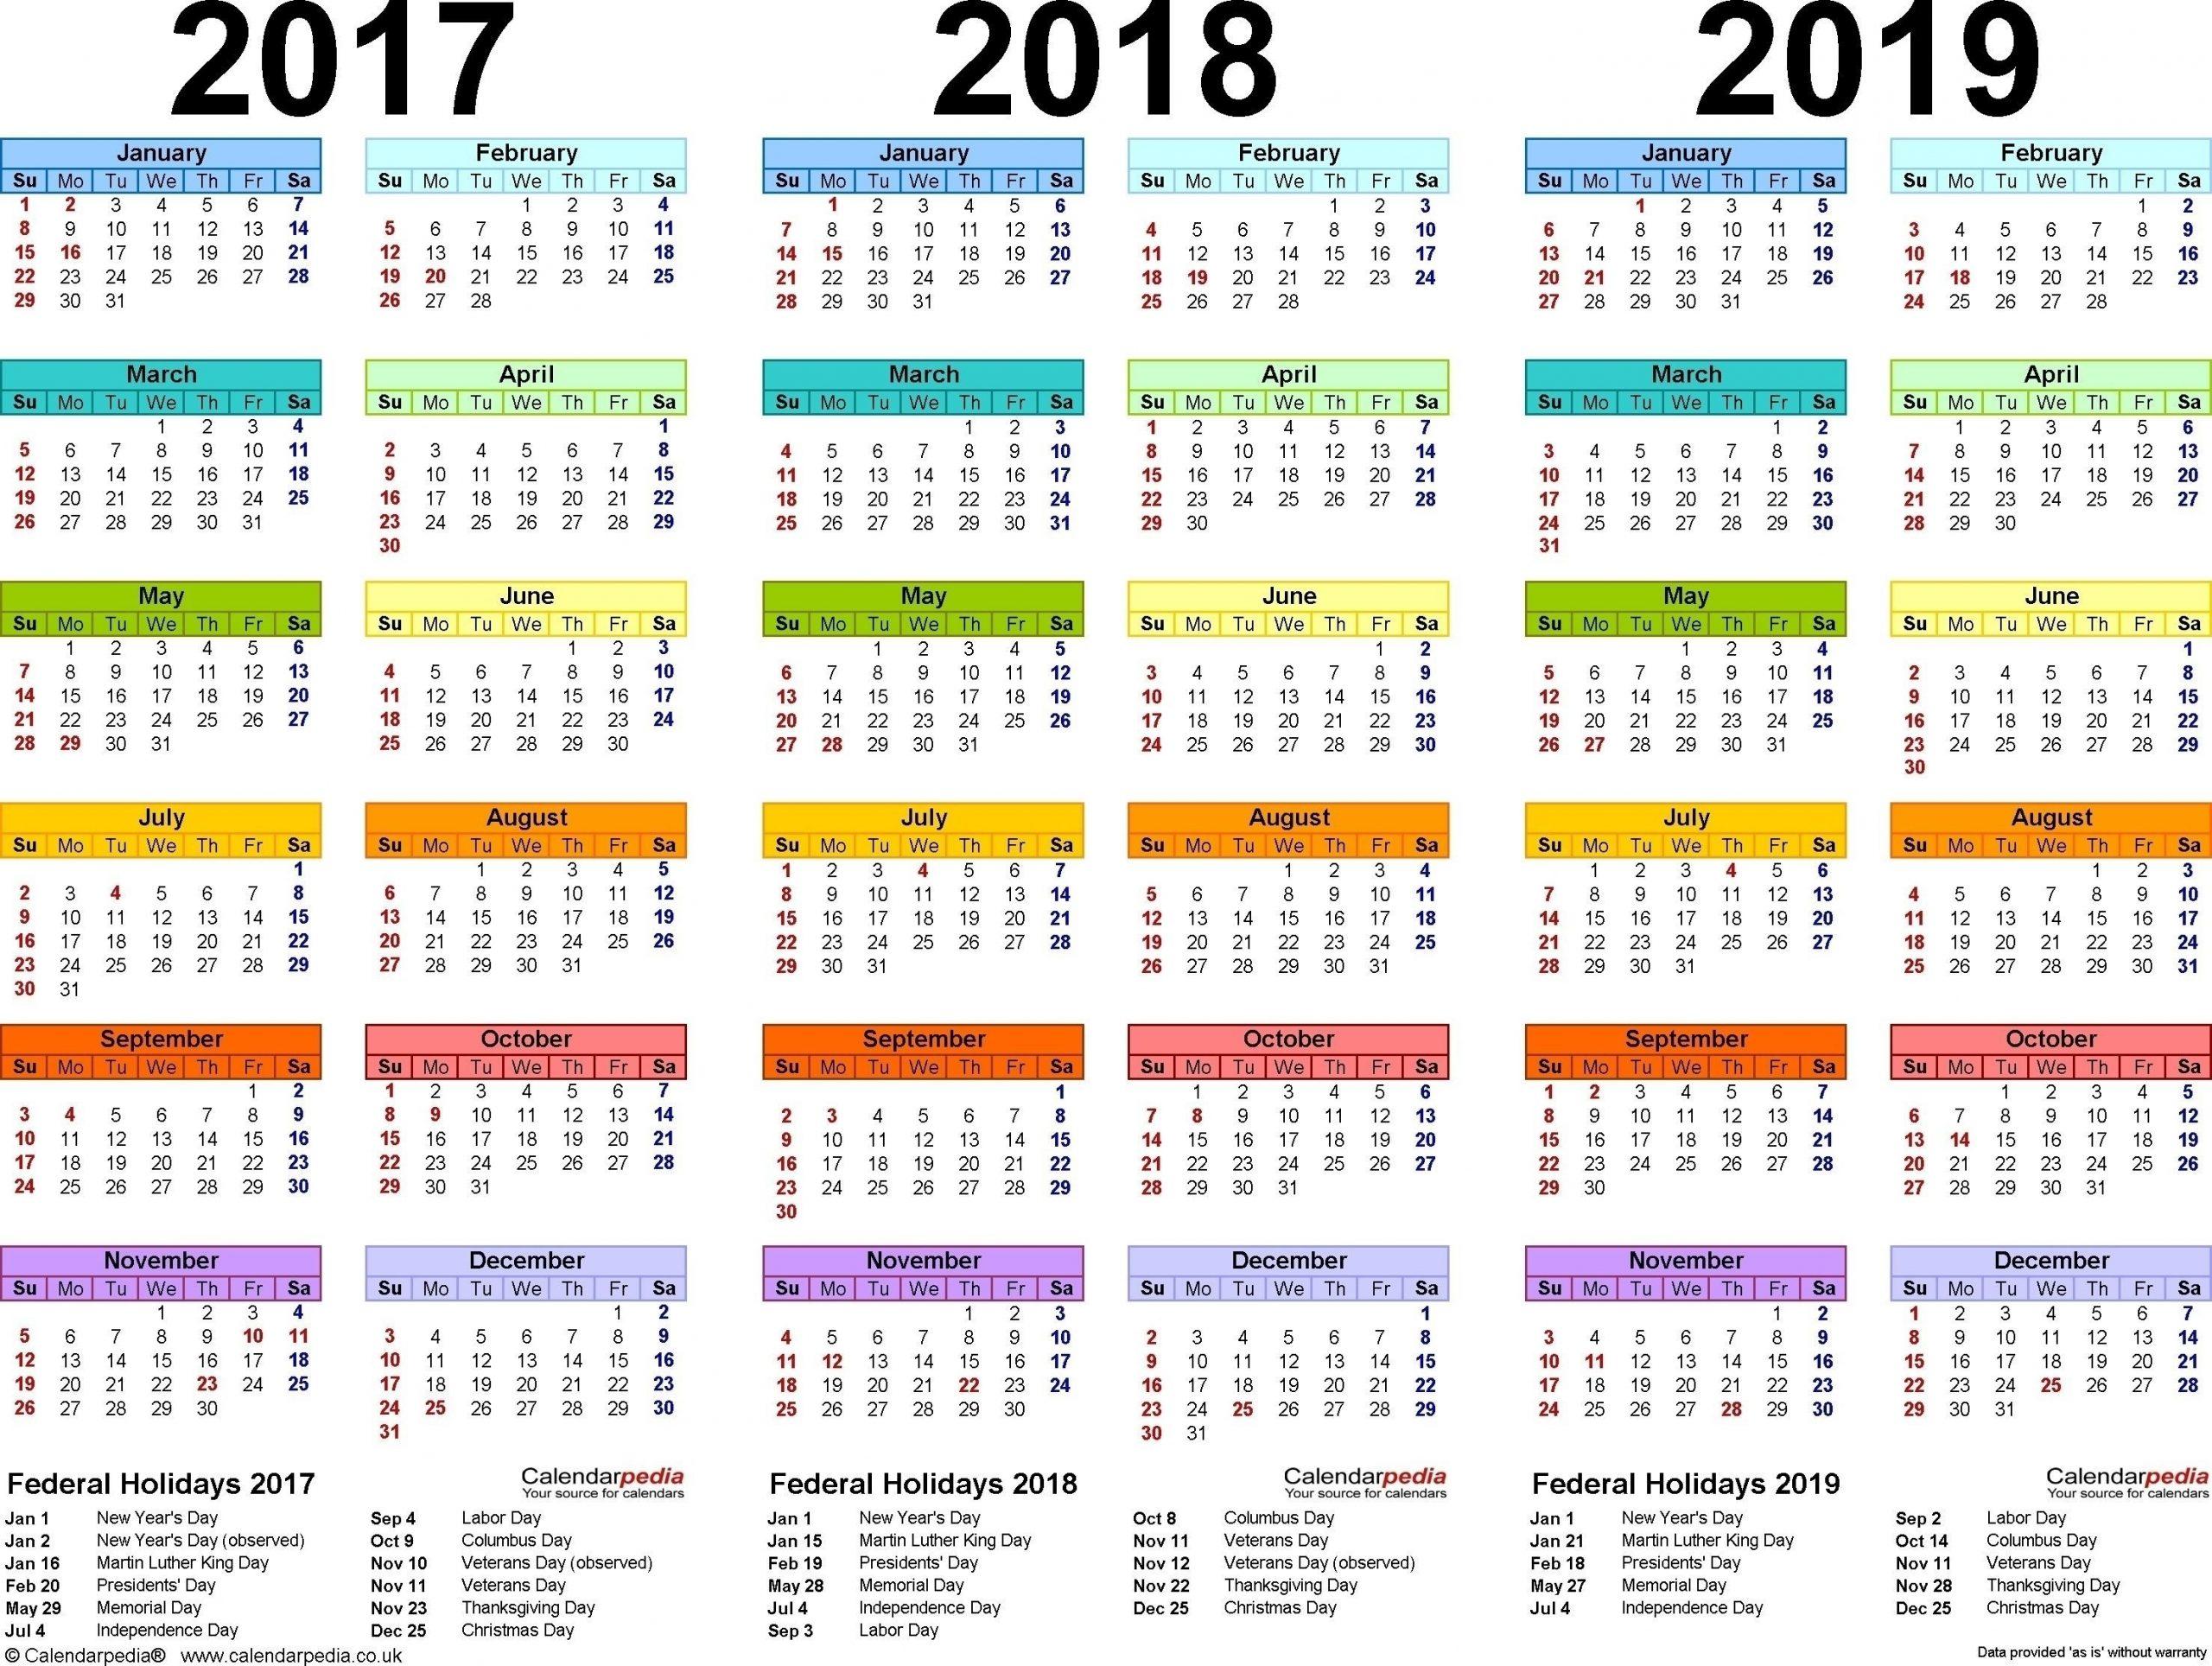 Depo Provera Calendar 2021 - Template Calendar Design